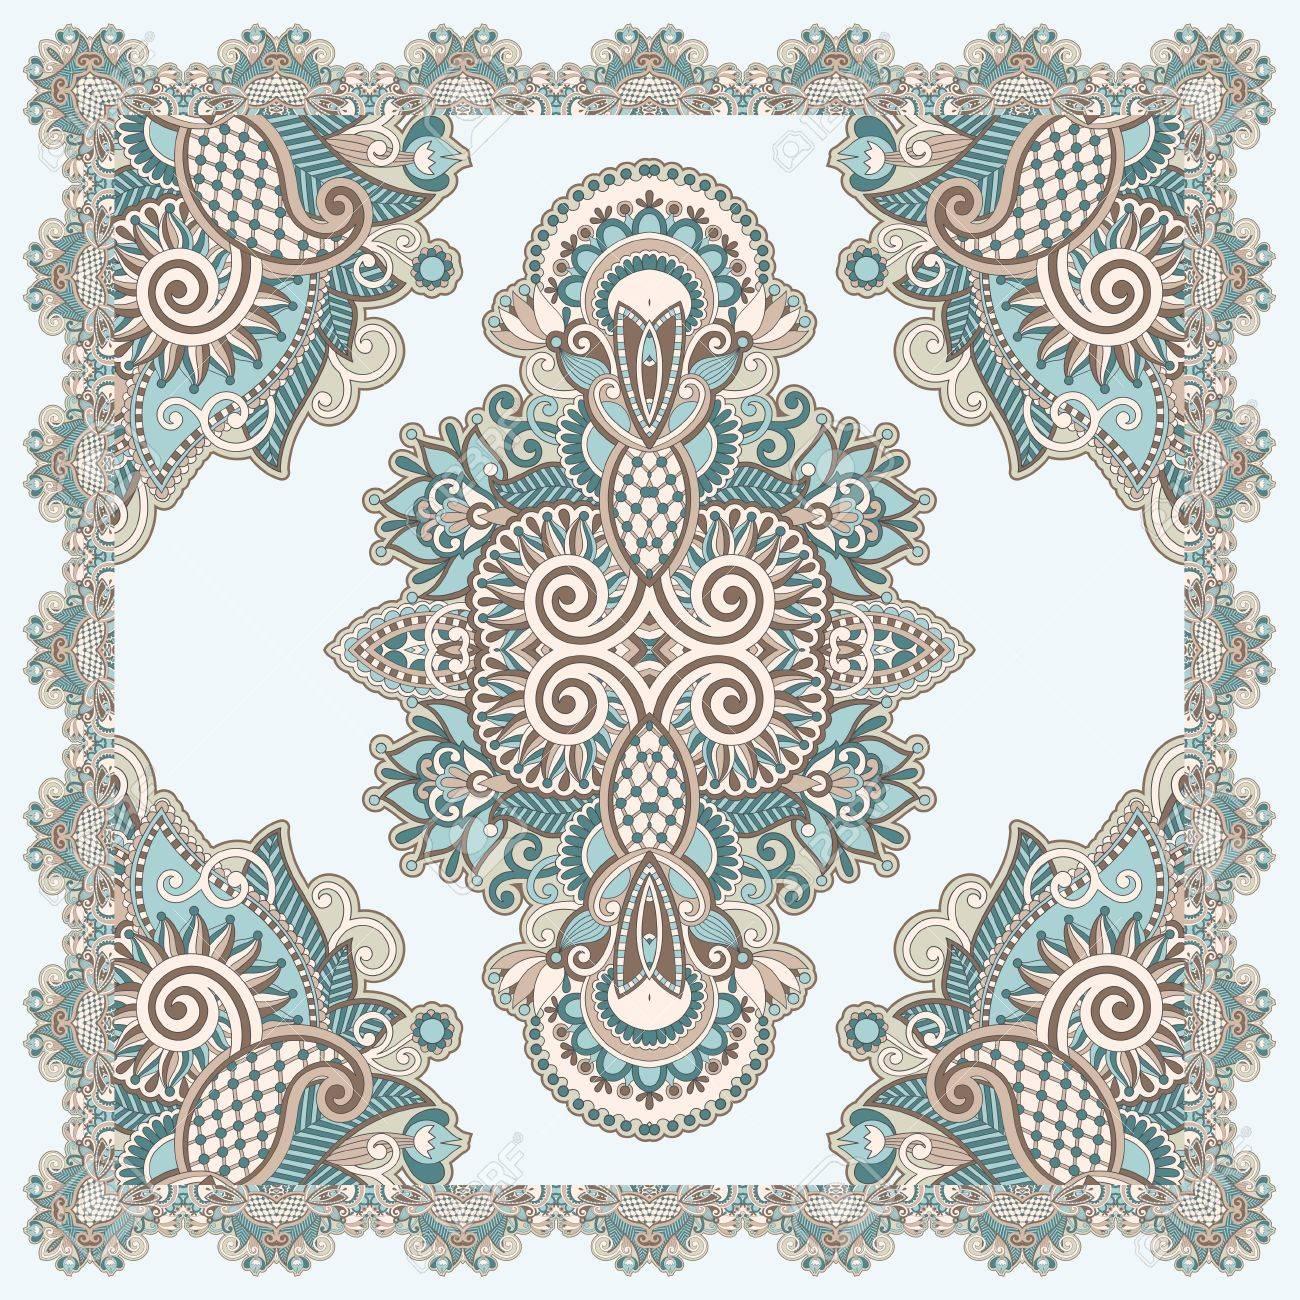 Traditional Ornamental Floral Paisley Bandana Stock Vector - 12392501